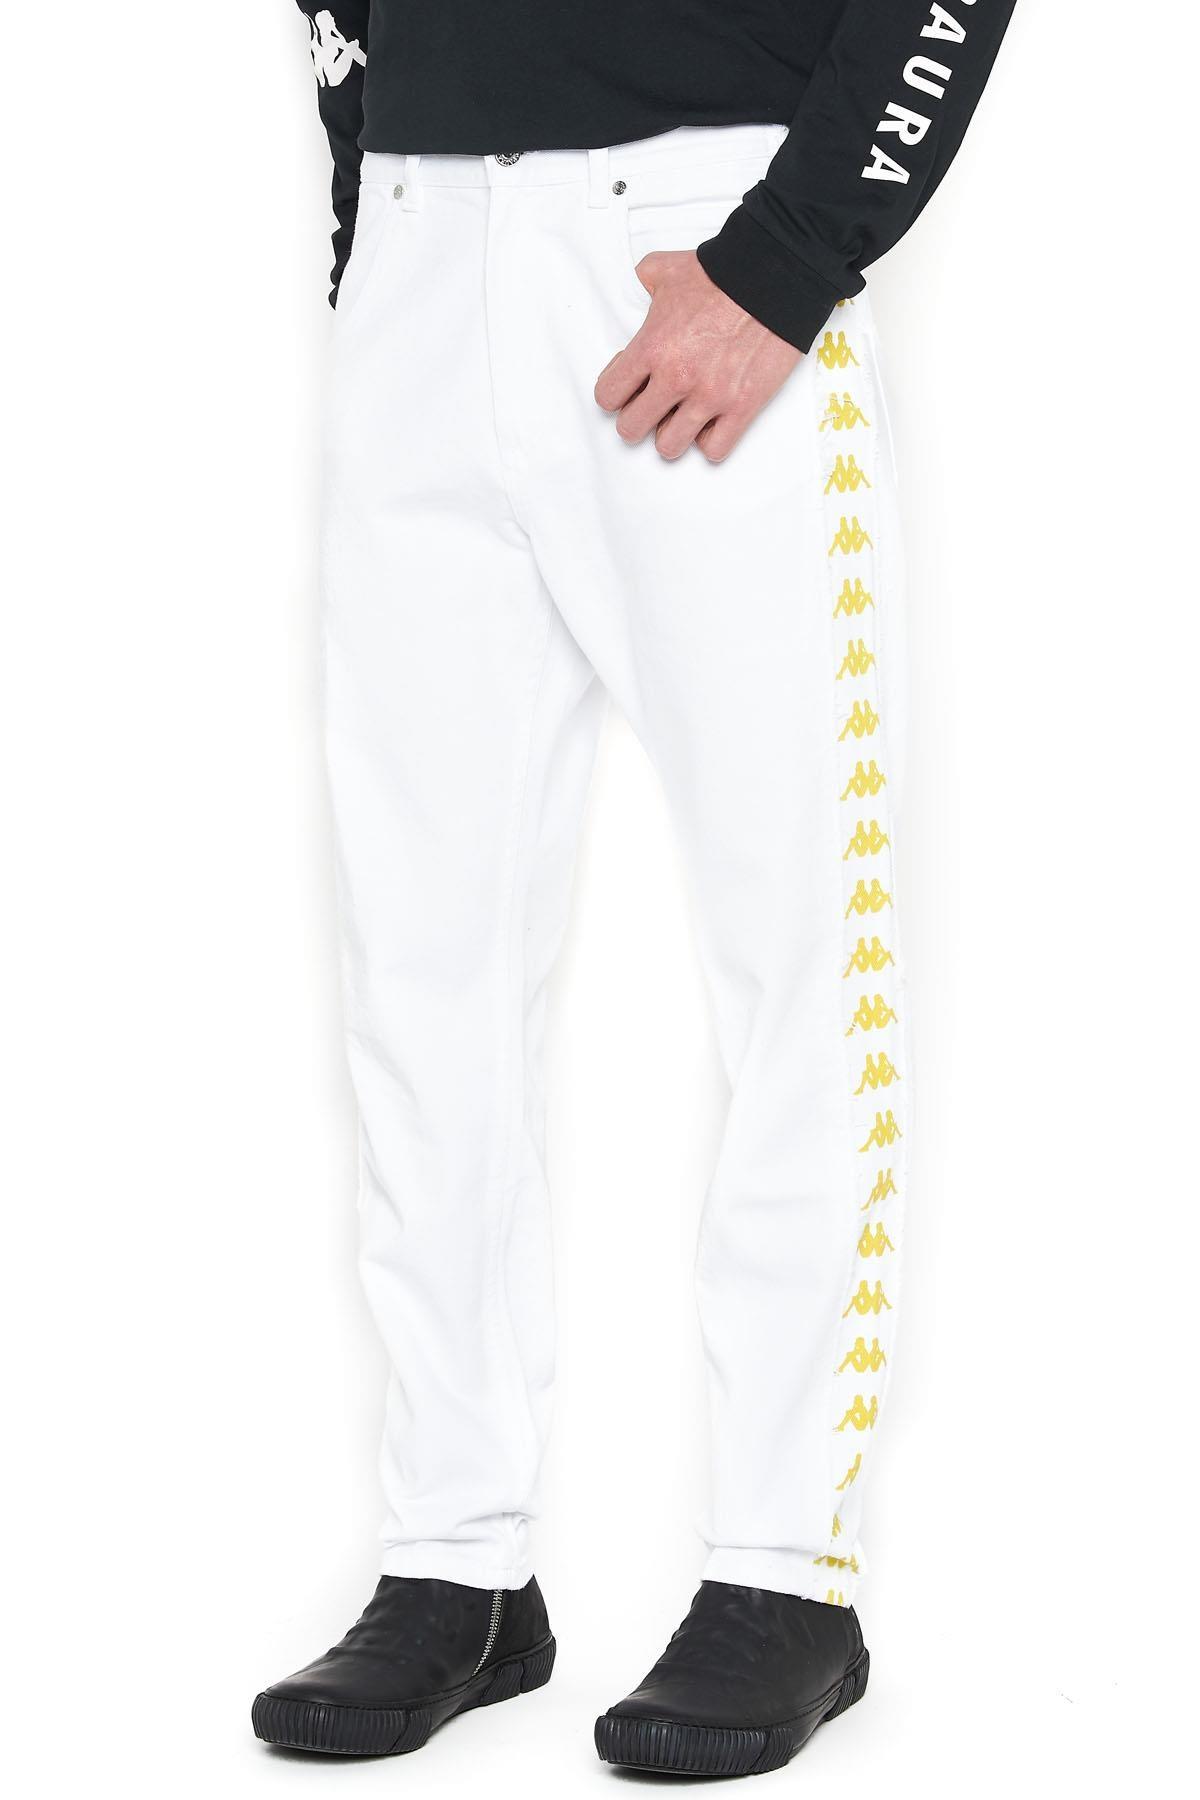 878a74e0 'mod.musa' jeans